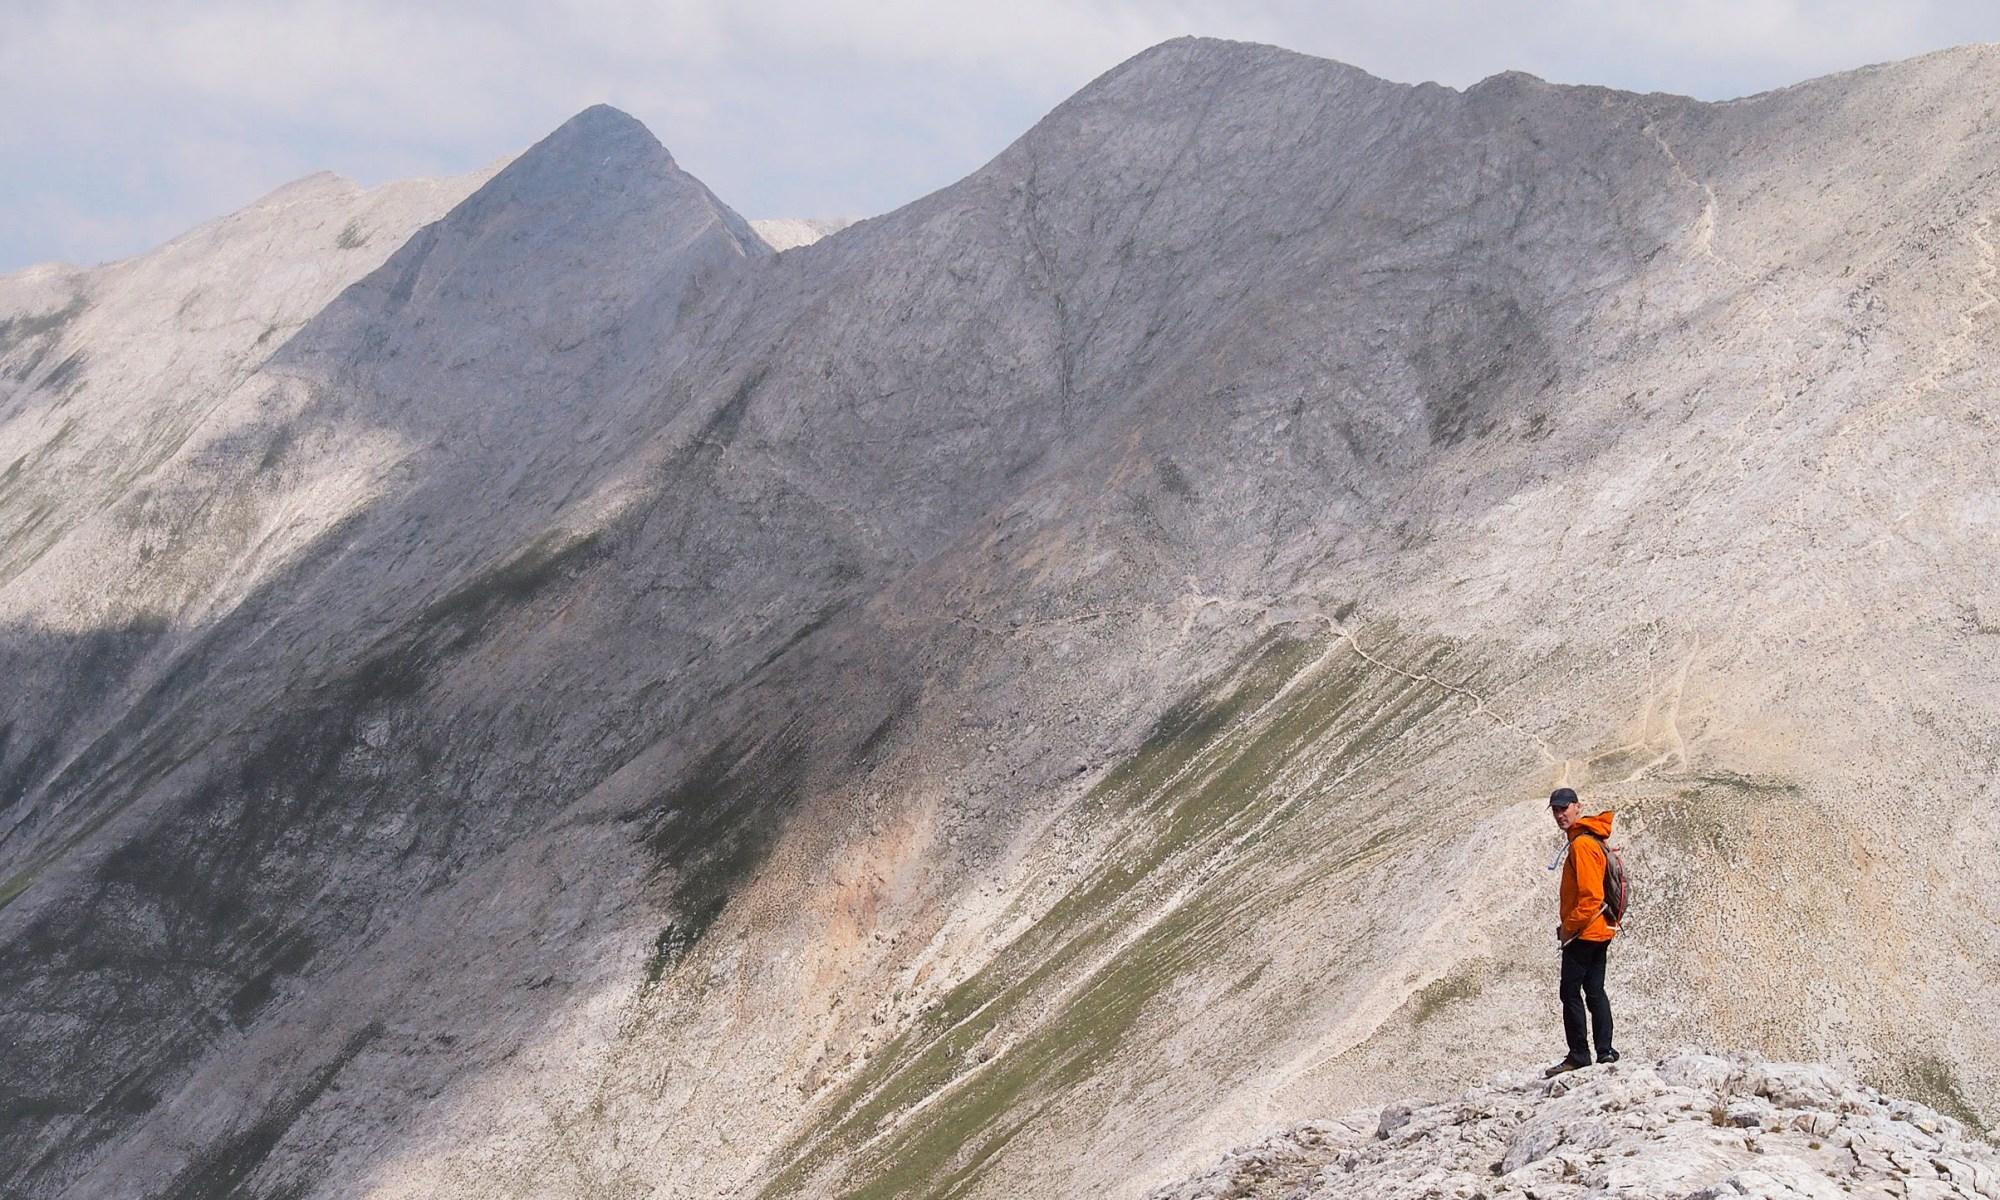 View of Koncheto Ridge from Mt. Vihren